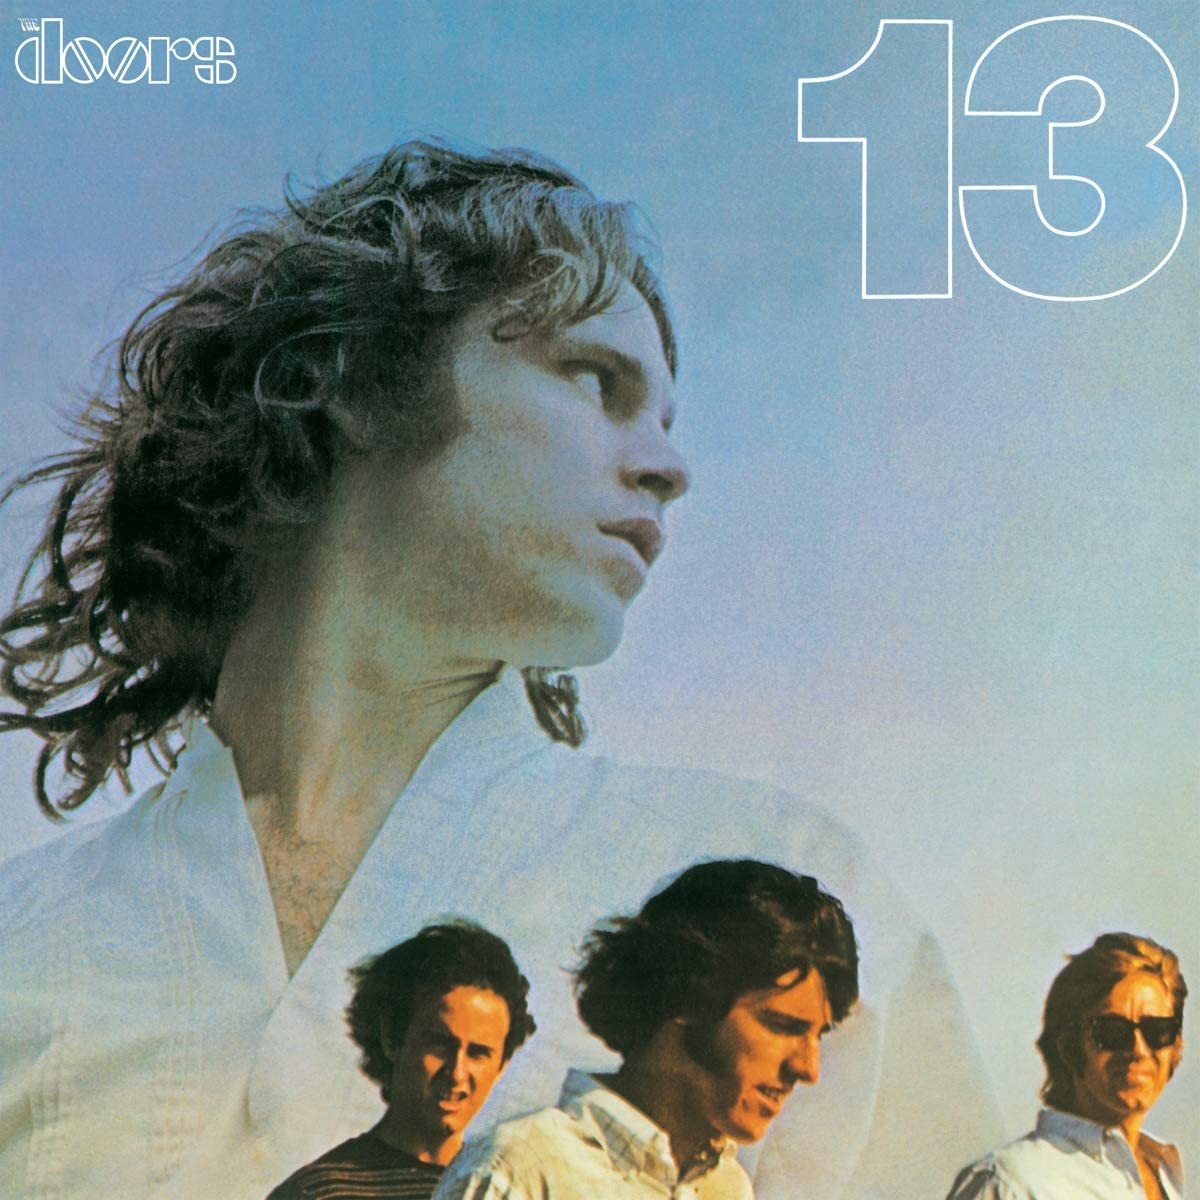 Copertina Vinile 33 giri 13 di The Doors